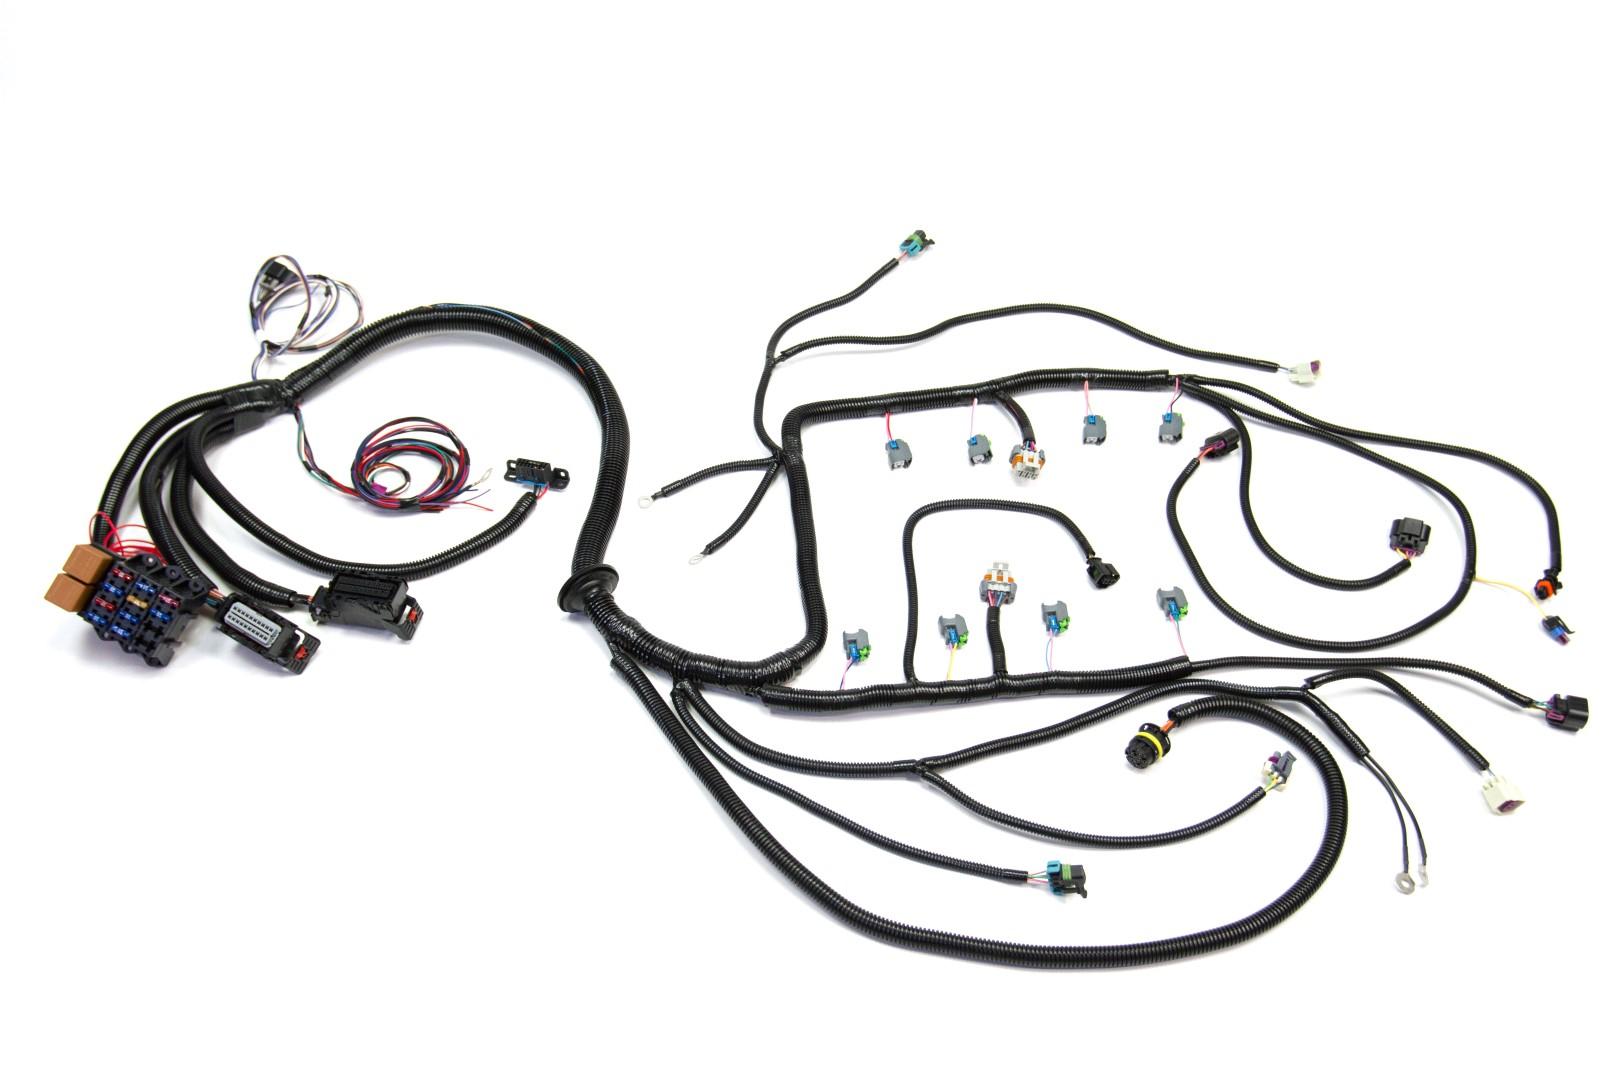 4 6 Standalone Wiring Harness Com